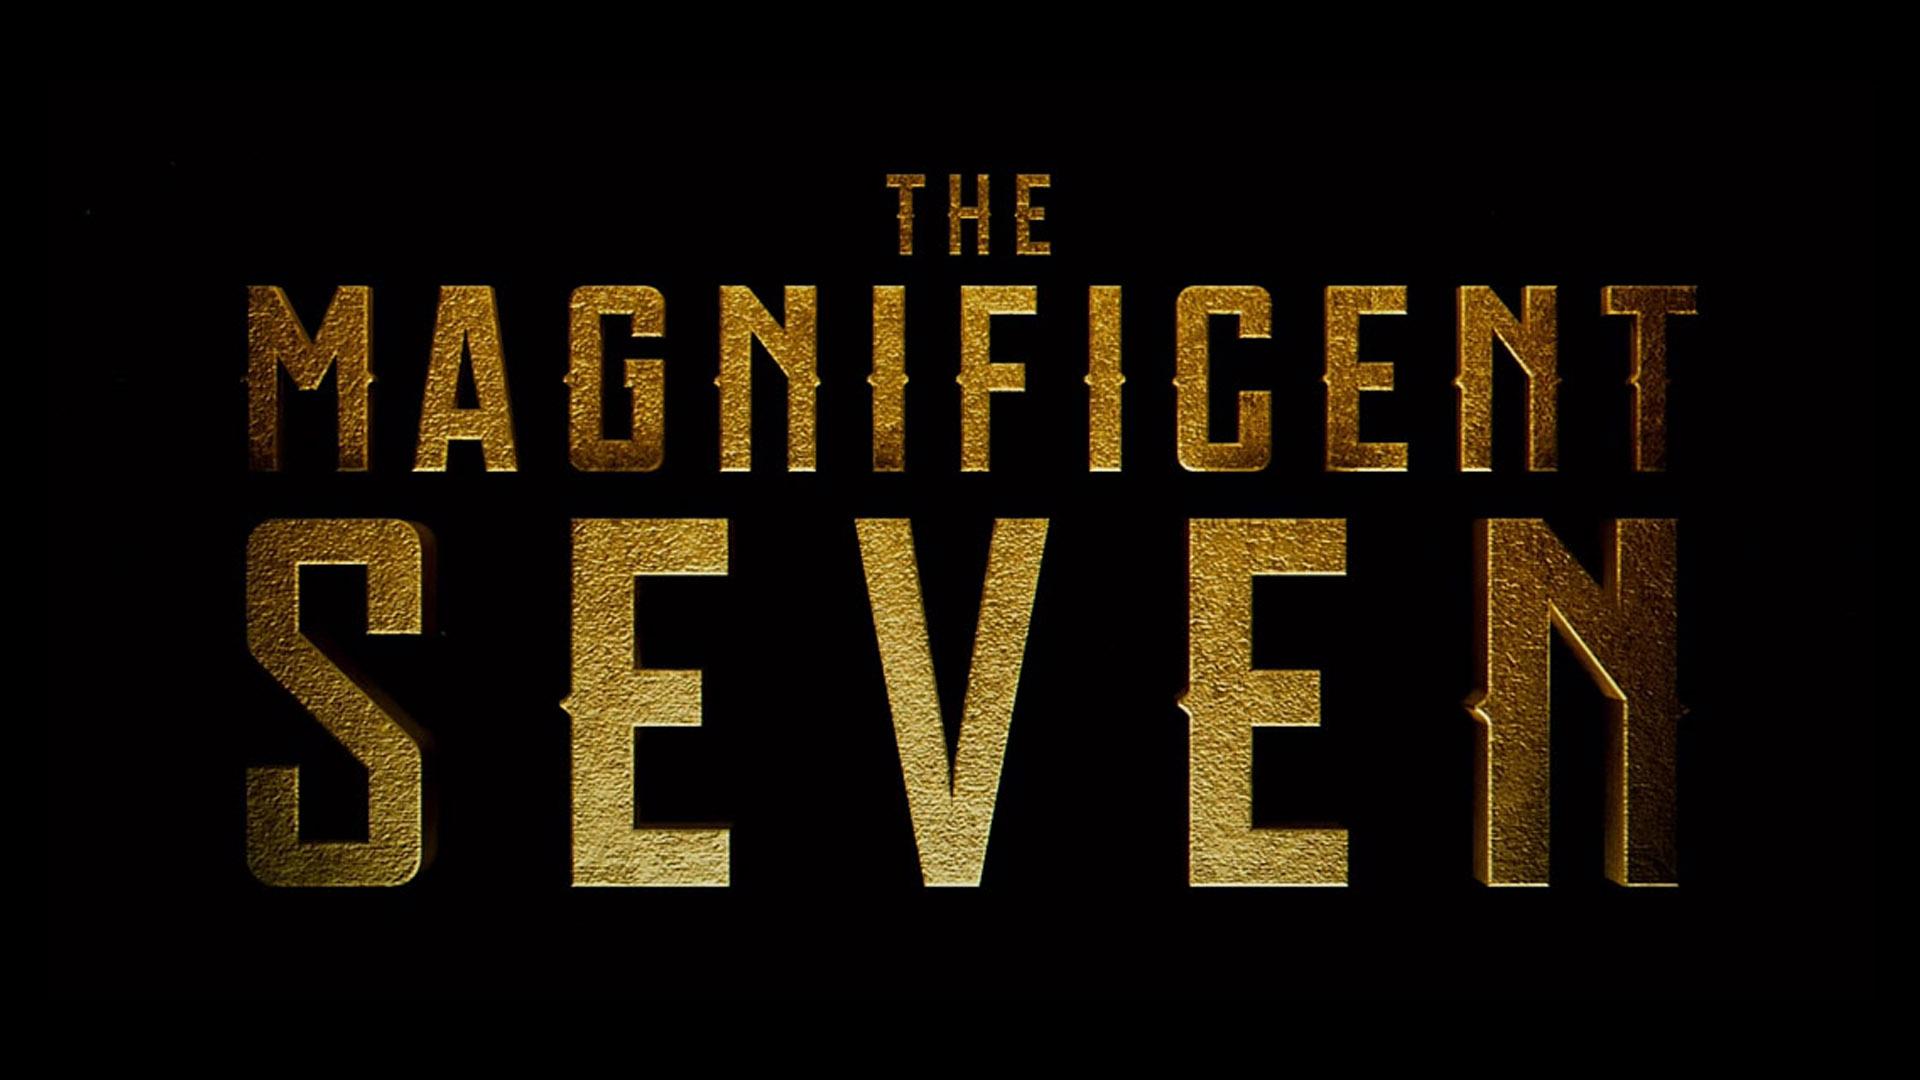 Steve Mcqueen Wallpaper Hd The Magnificent Seven Wallpaper 4